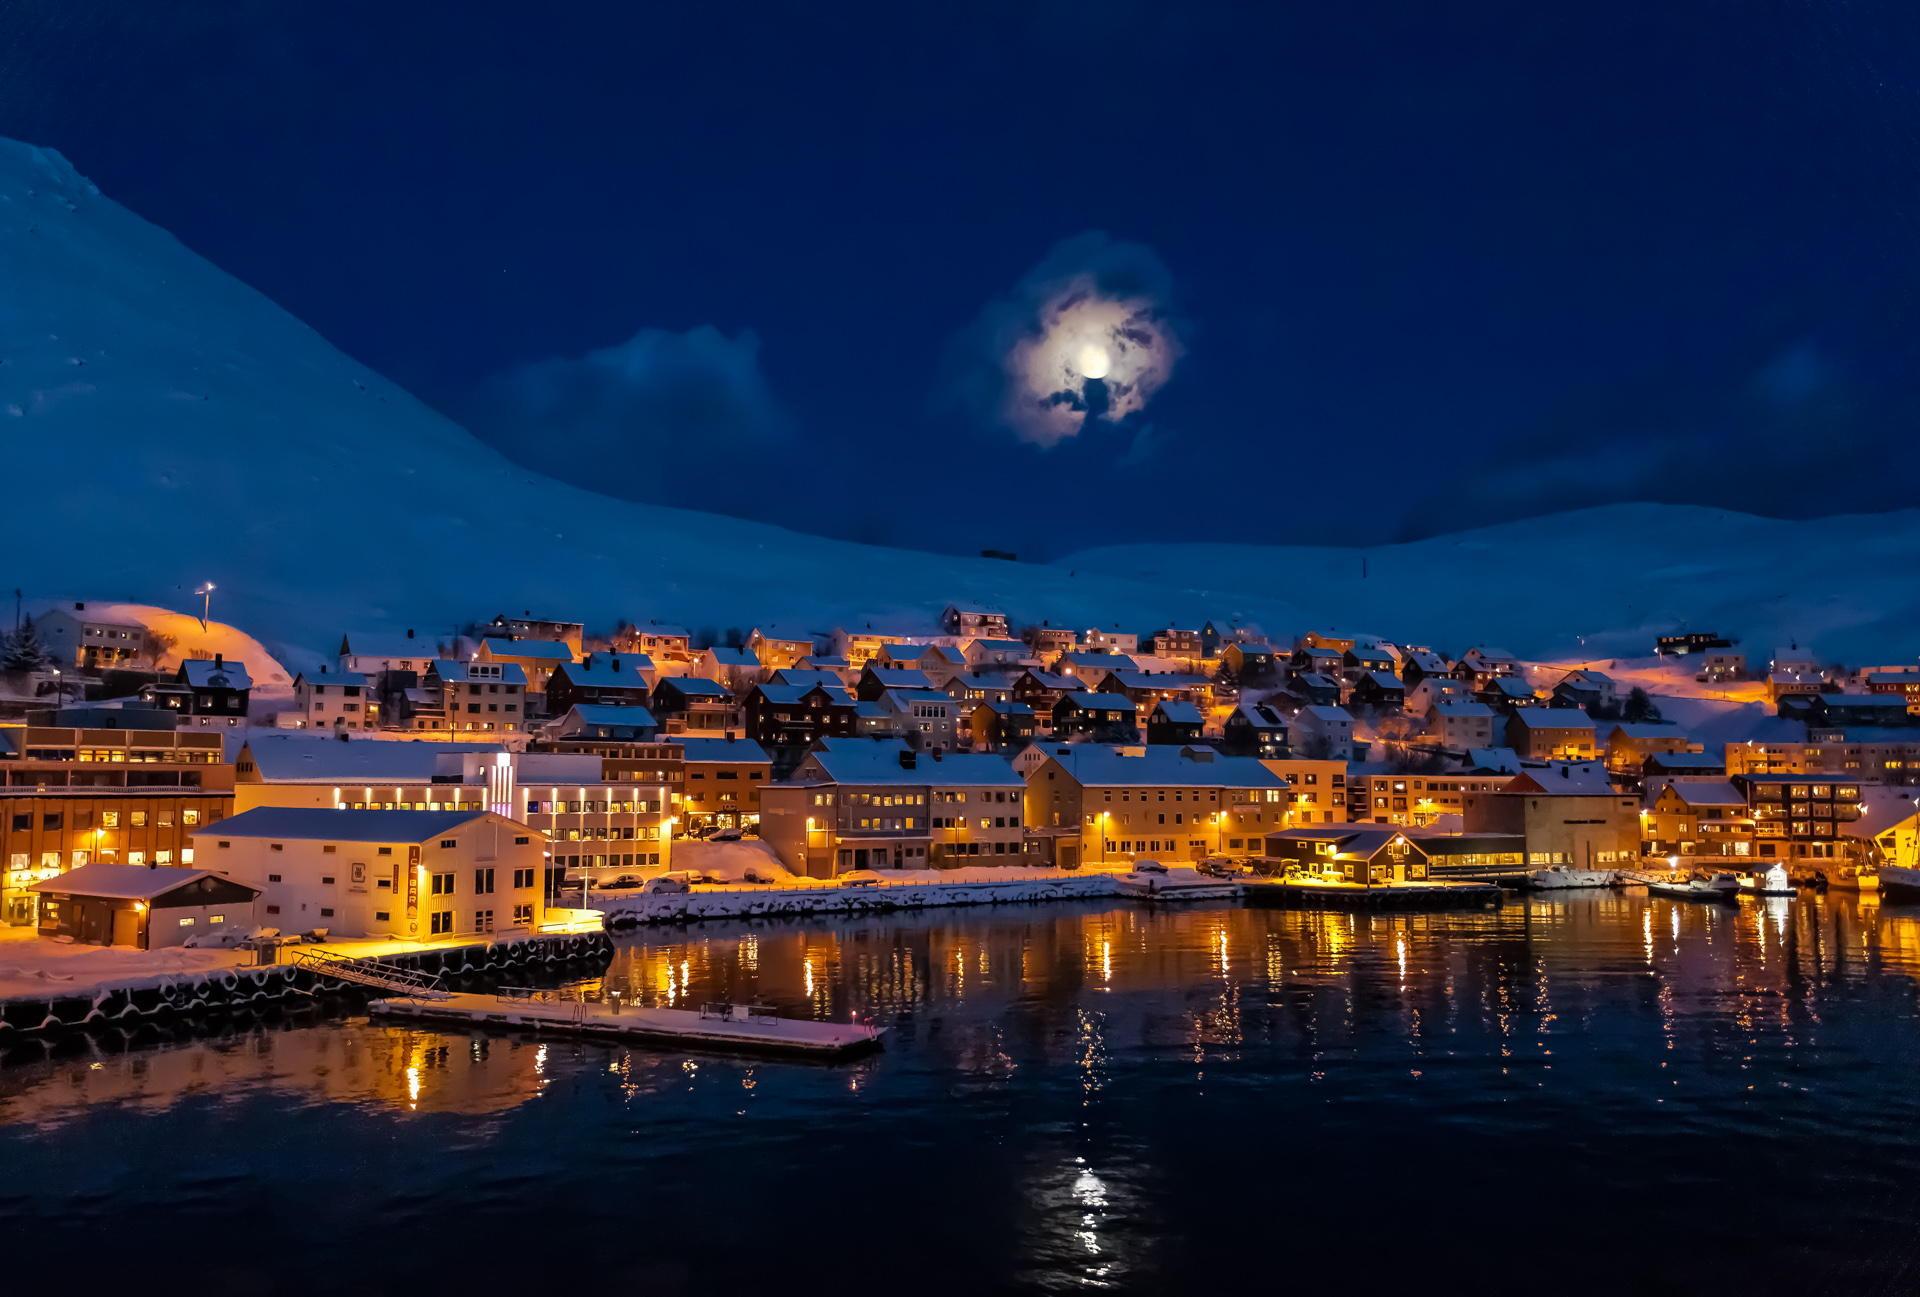 луна над городом  № 1456781 бесплатно